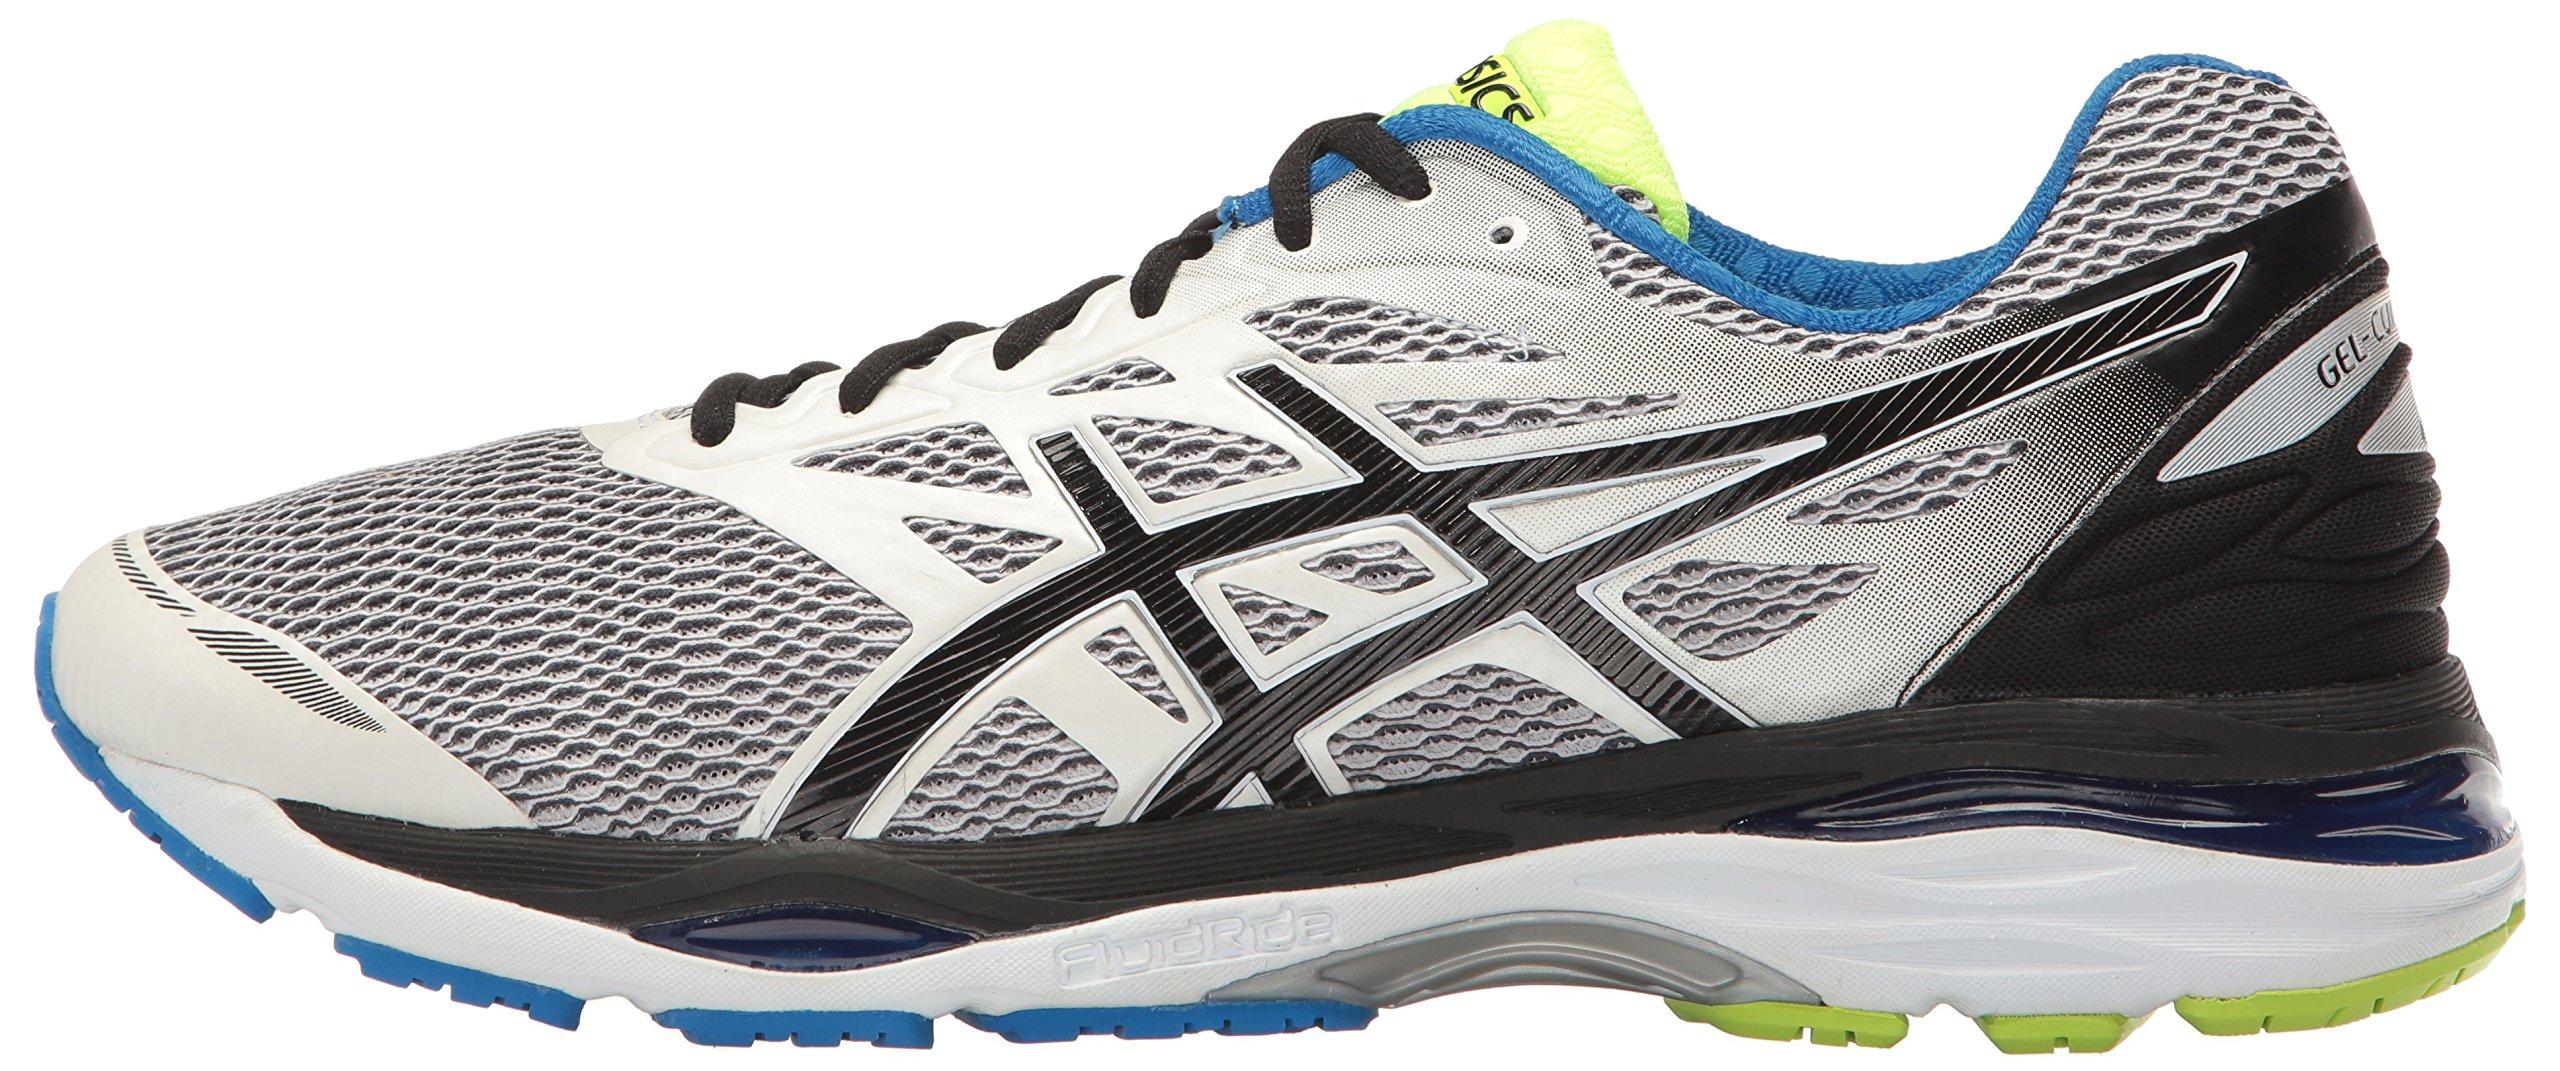 81eB8ynYzLL - ASICS Men's Gel-Cumulus 18 Running Shoe